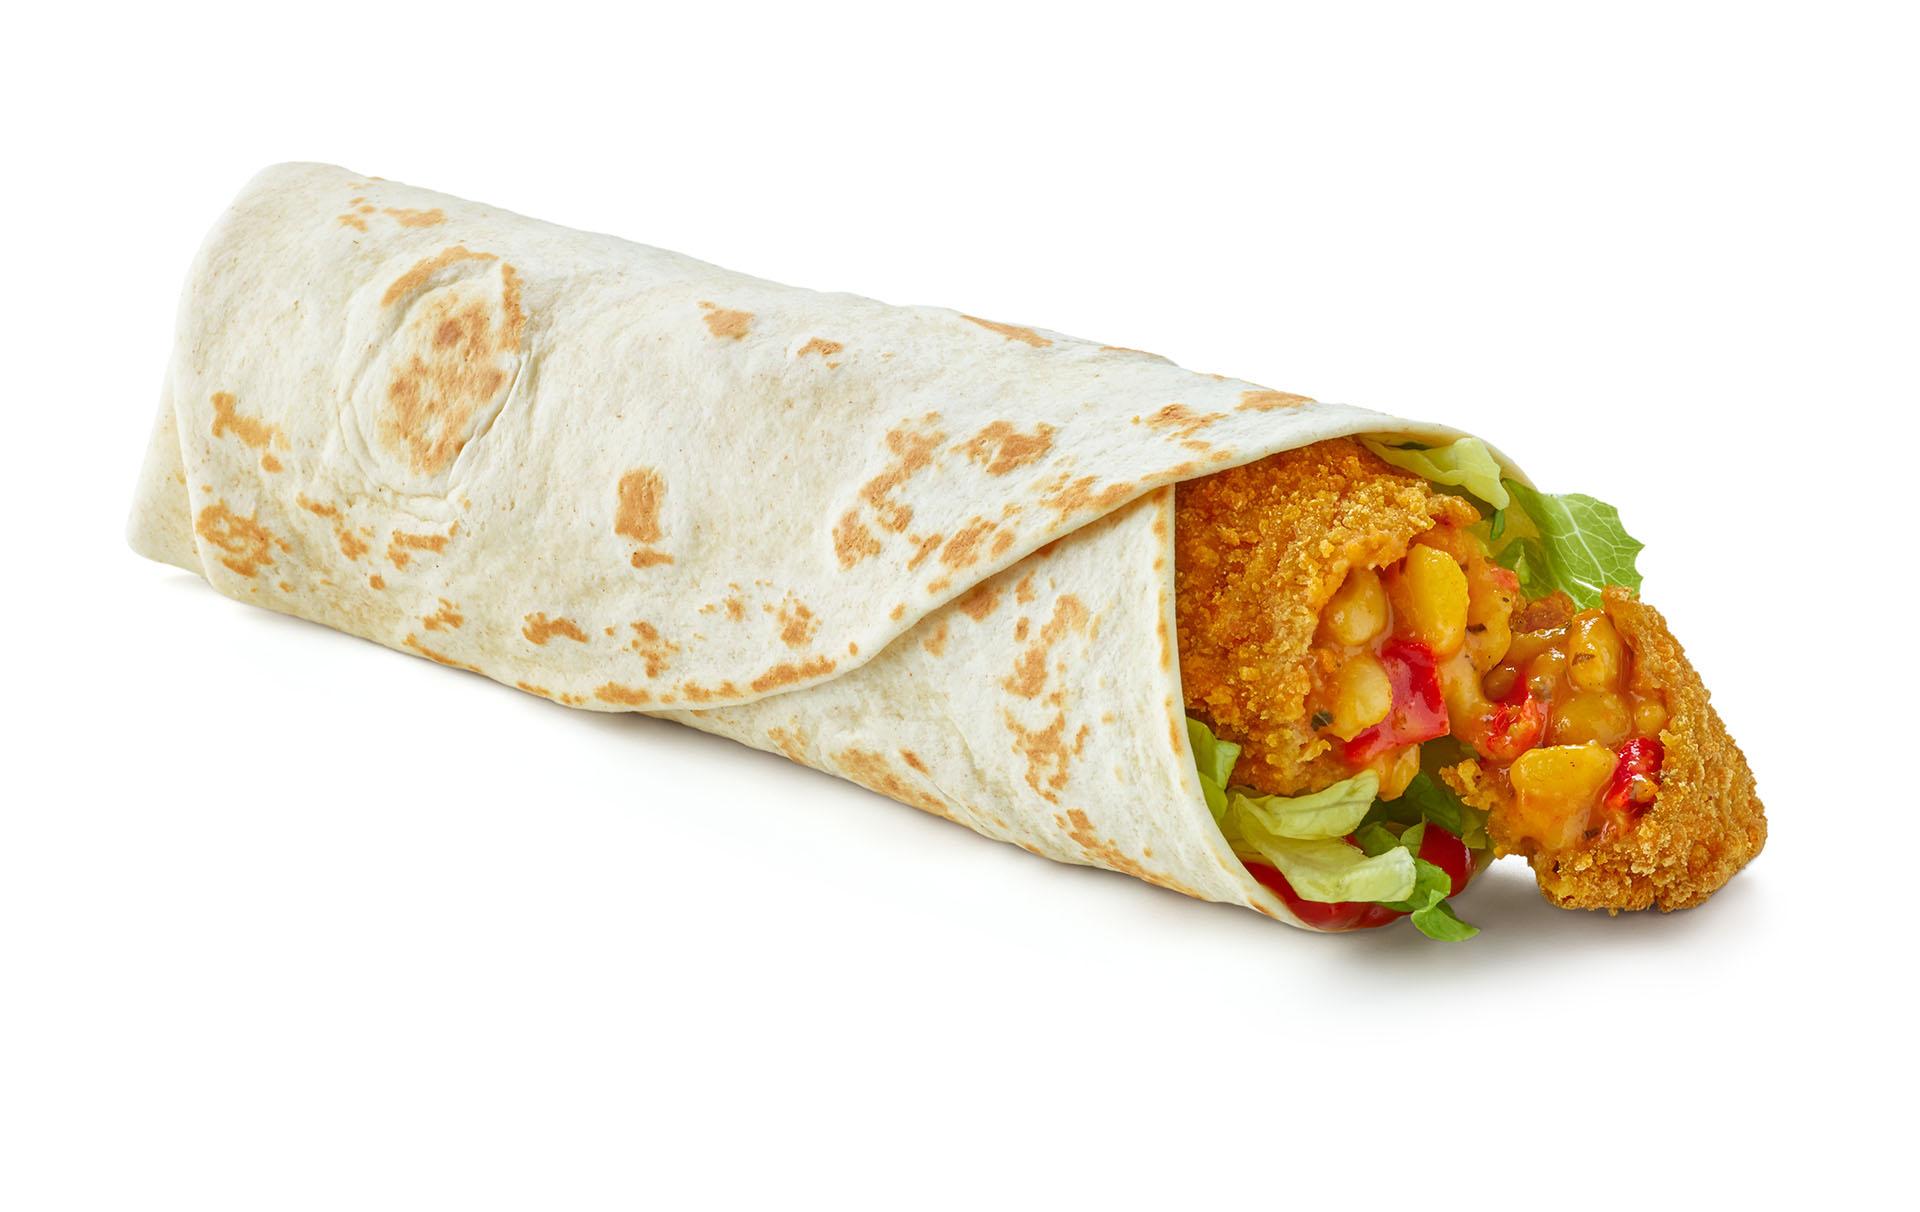 McDonald's veggie happy meal